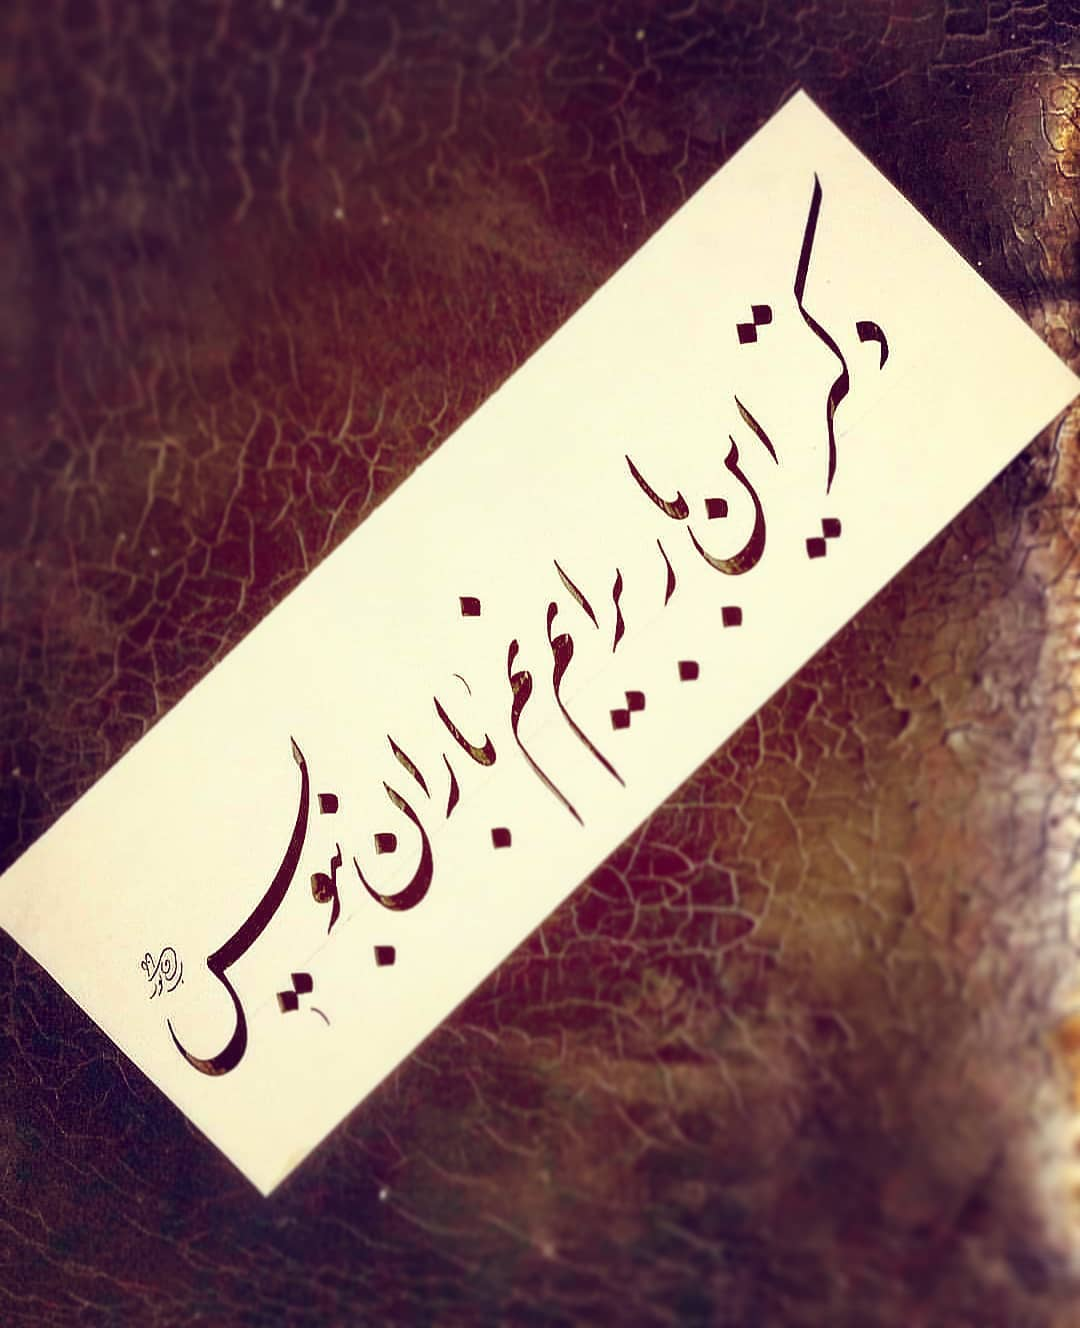 Farisi/Nasta'liq khatestan  ﷽ دکتر این بار برایم نم باران بنویس . #خطستان  @khatestan #خط_خودکاری#خط_خودکار… 820